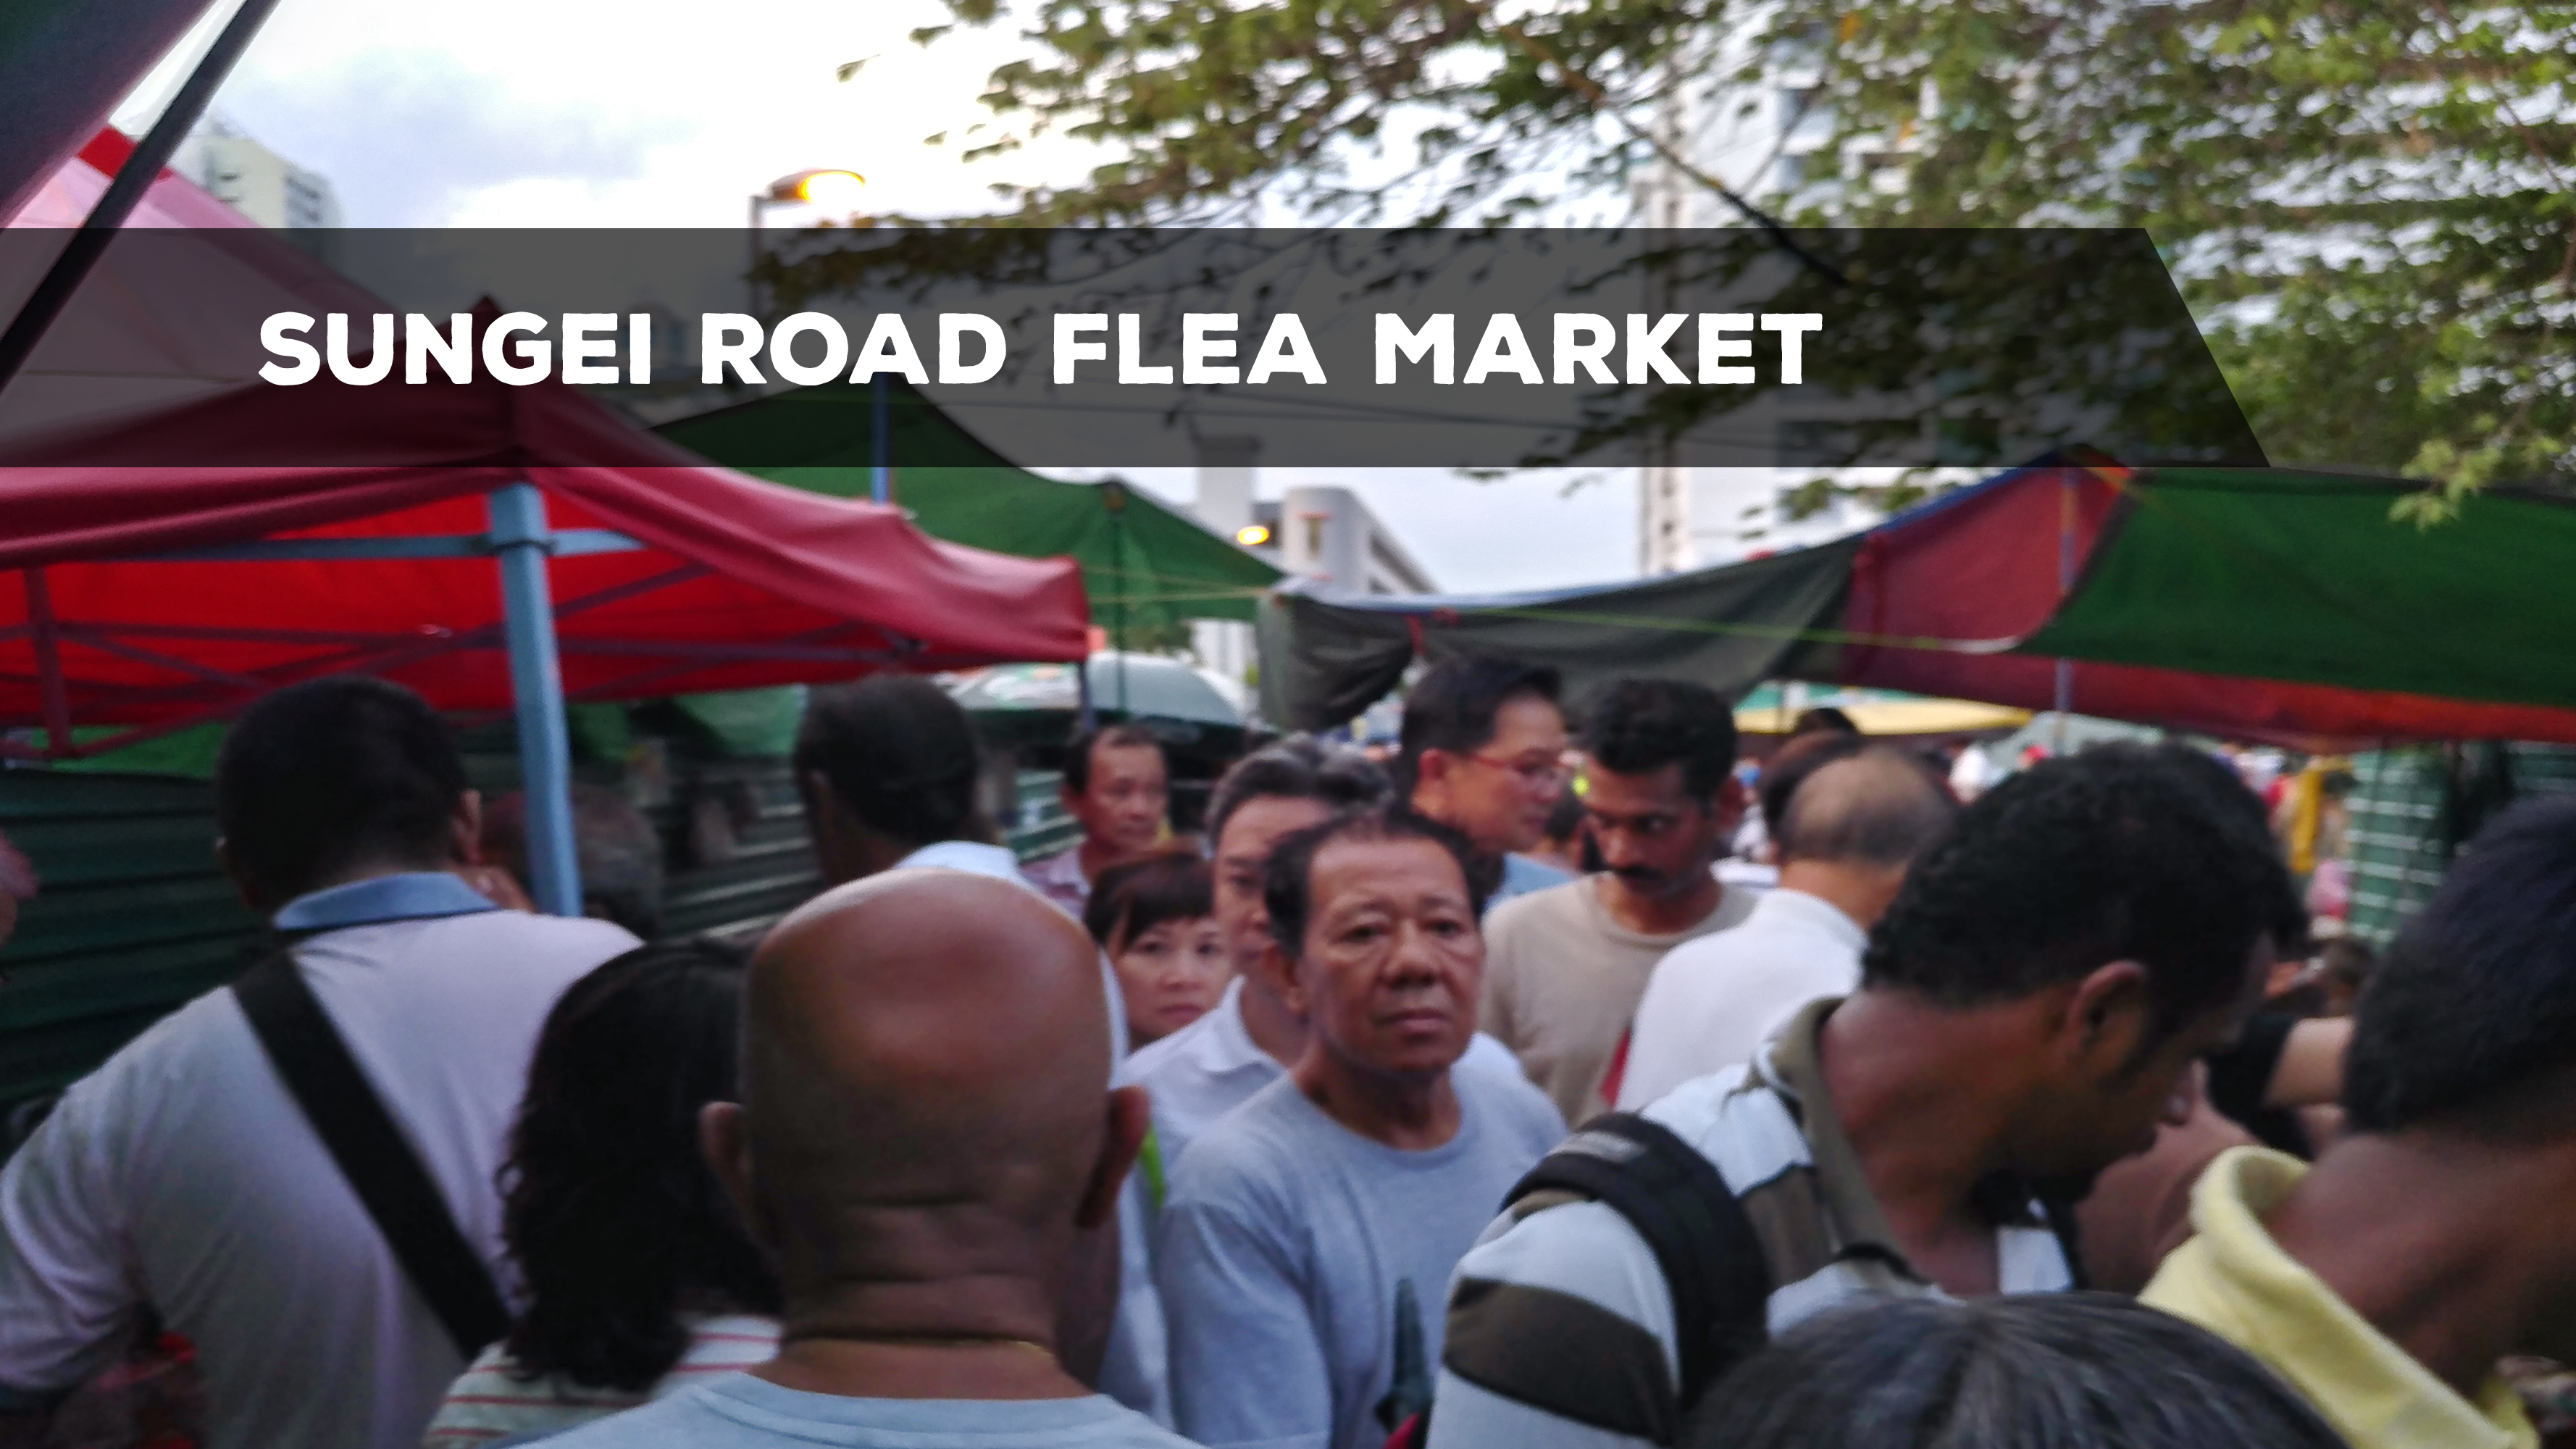 Sungei Road Flea Market